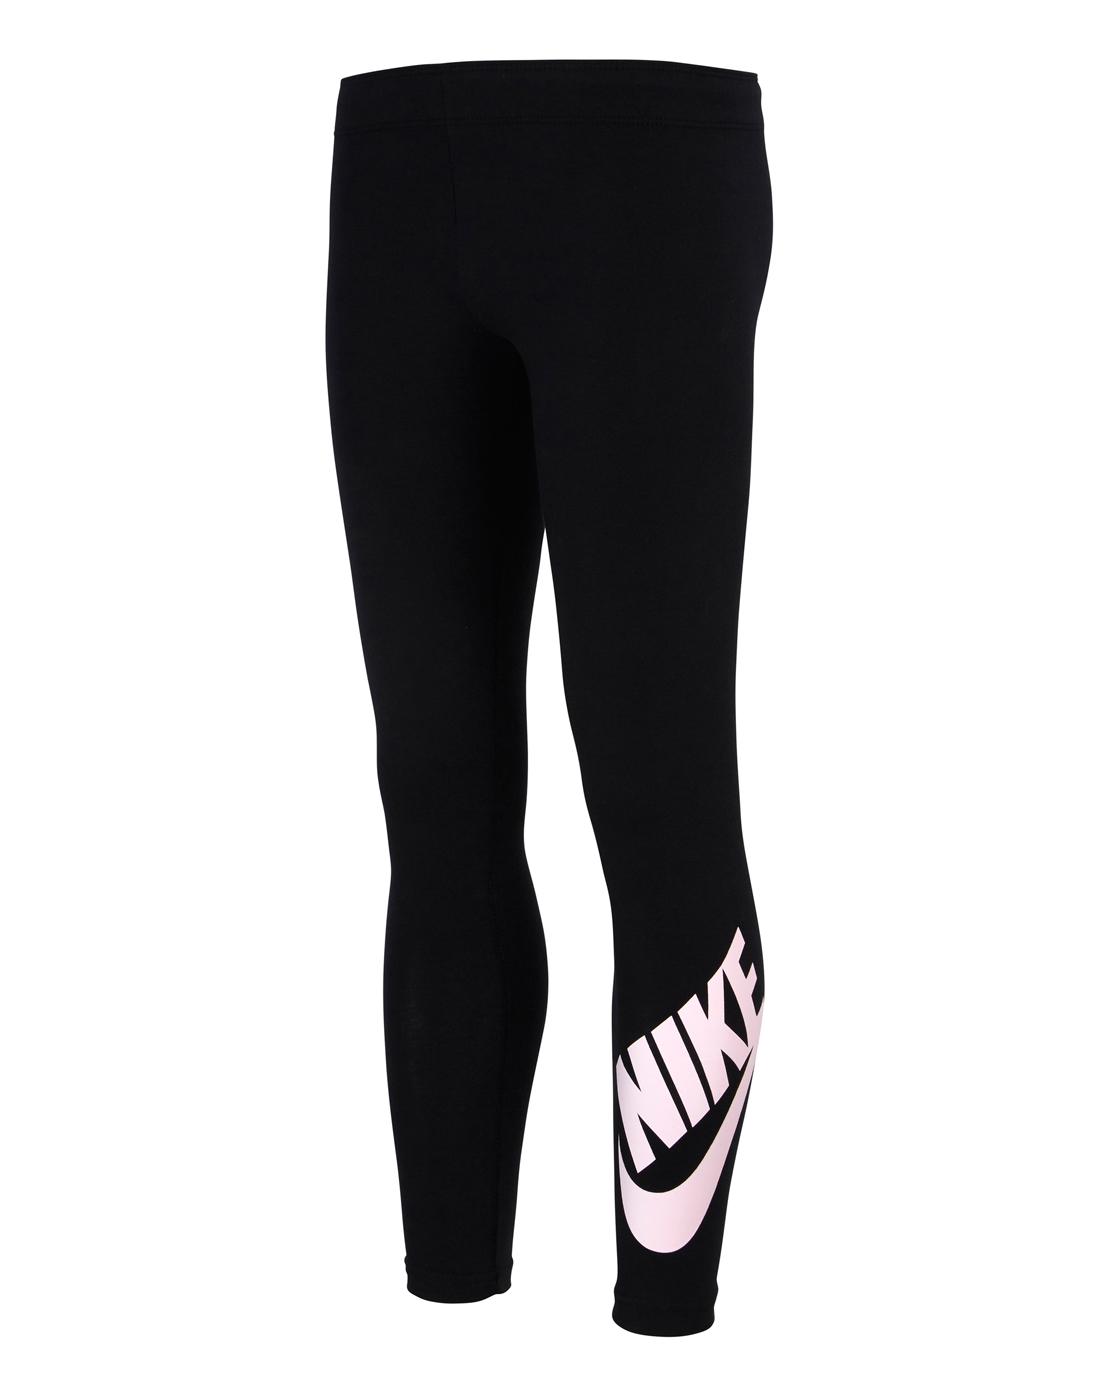 cc0cb5e47c8237 Older Girls Nike Logo Leggings   Black   Life Style Sports